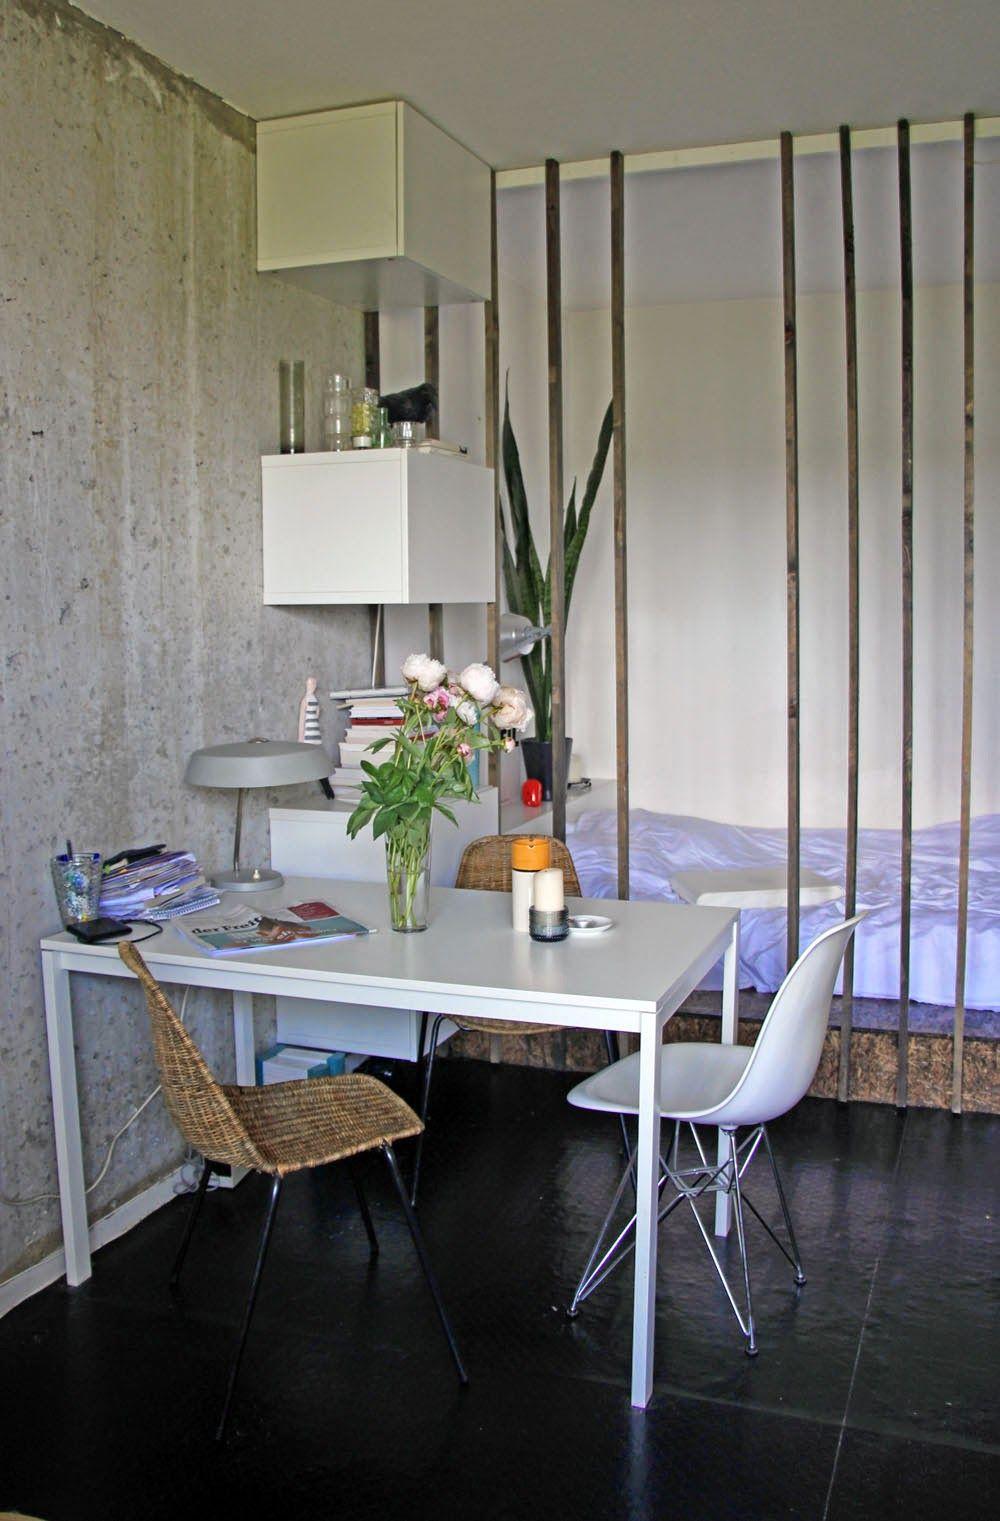 A Home In A Plattenbau Plattenbau Wohnen Haus Deko